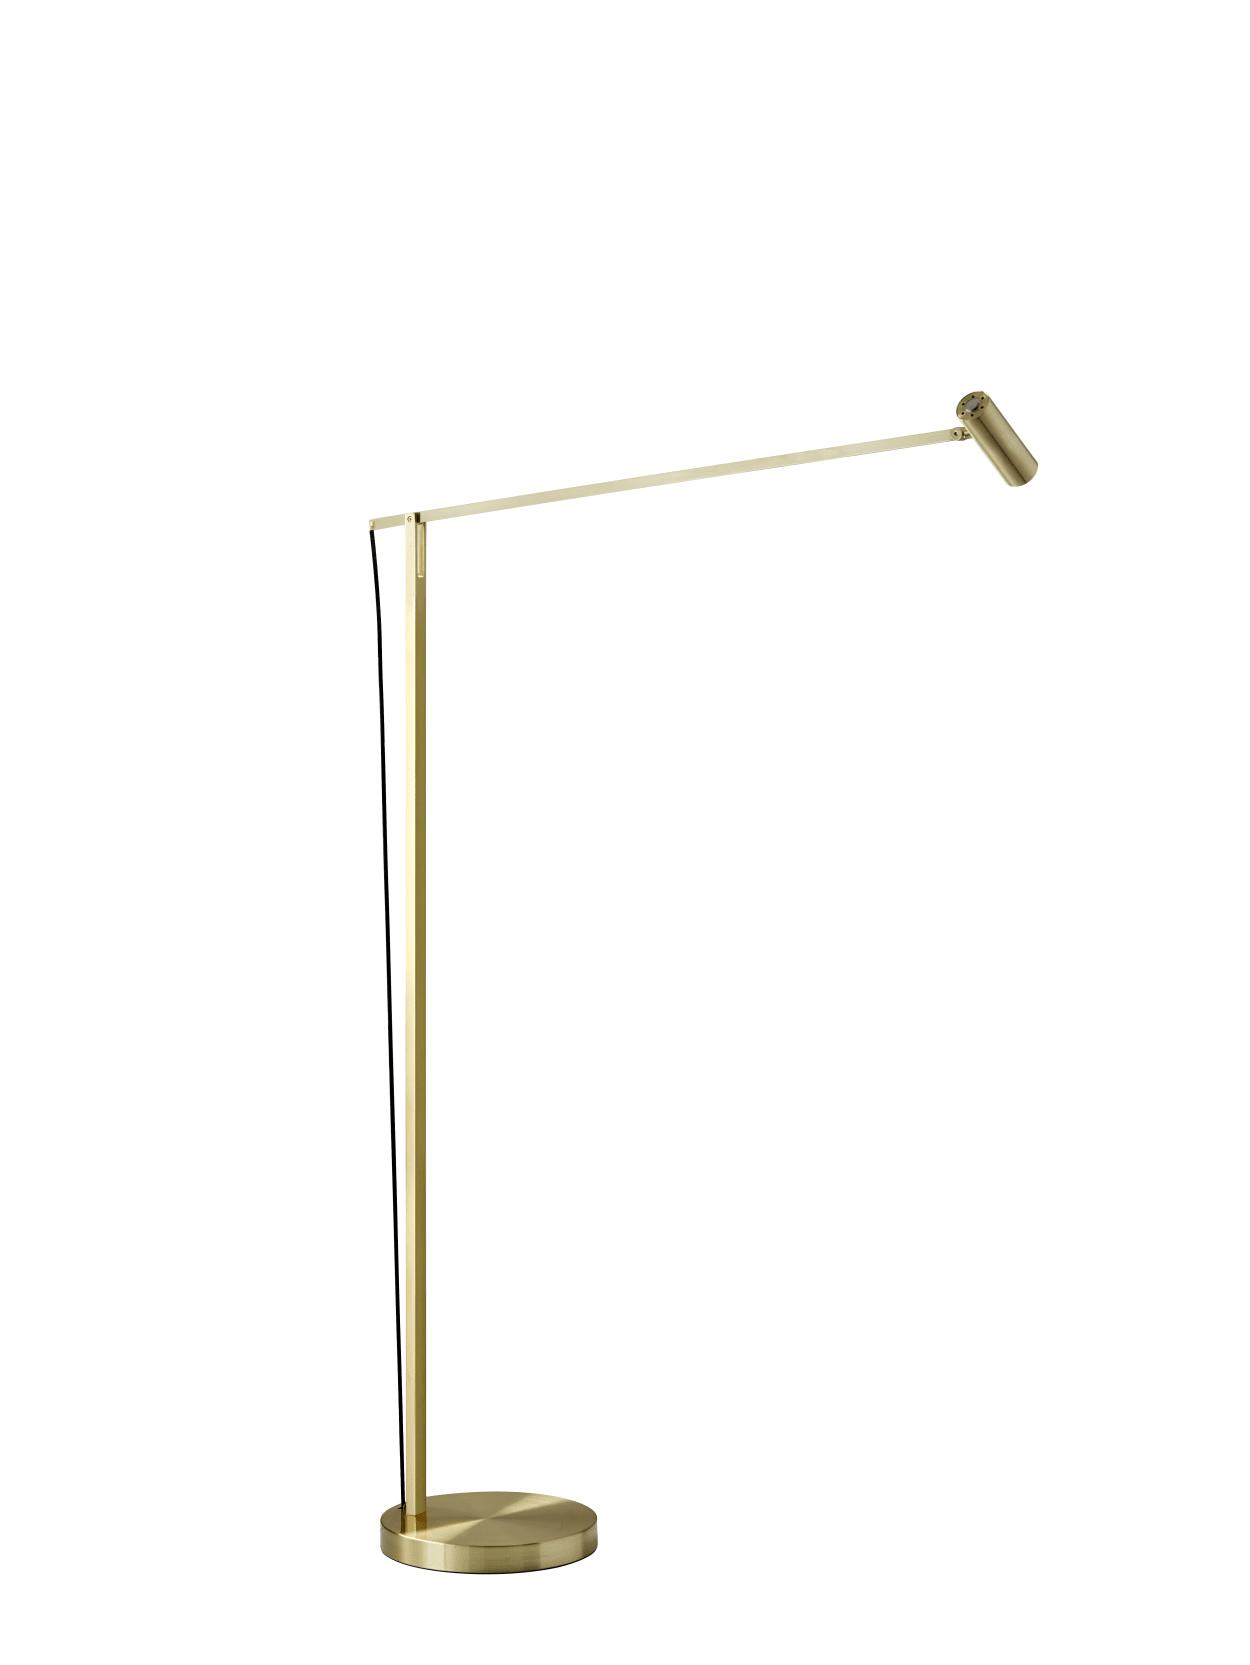 Image of: Adesso Ads360 Crane Floor Lamp Brushed Gold Office Depot